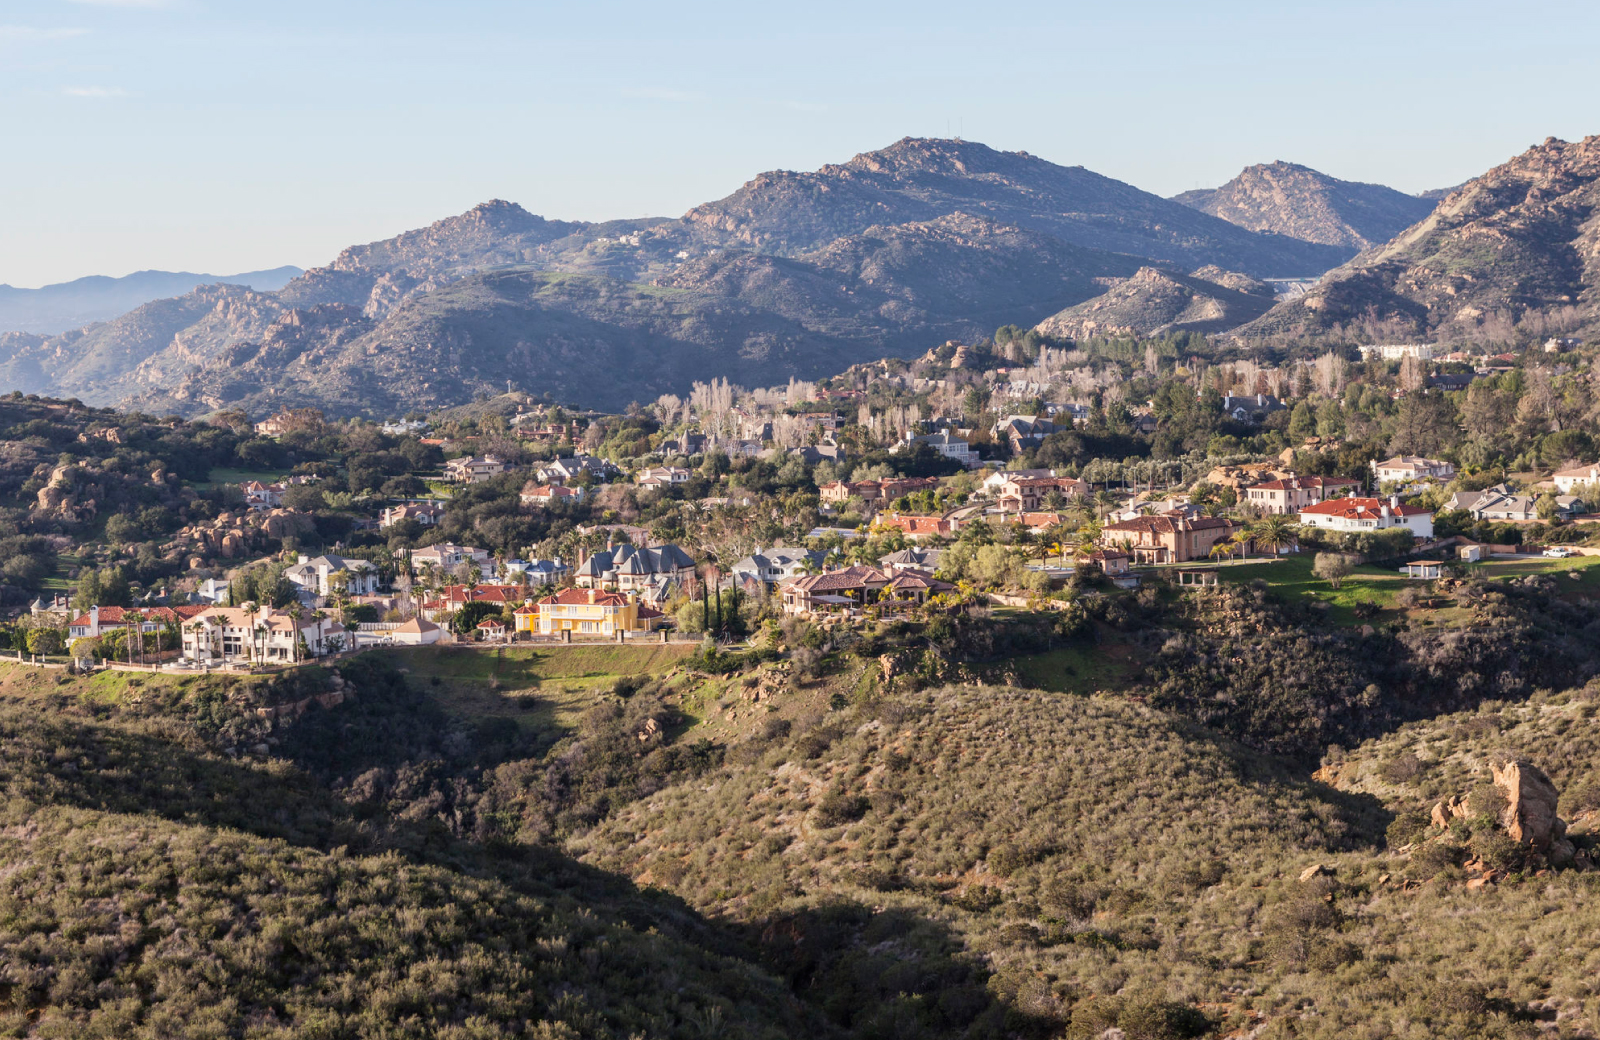 Northridge Los Angeles Mountains - Alder Apts